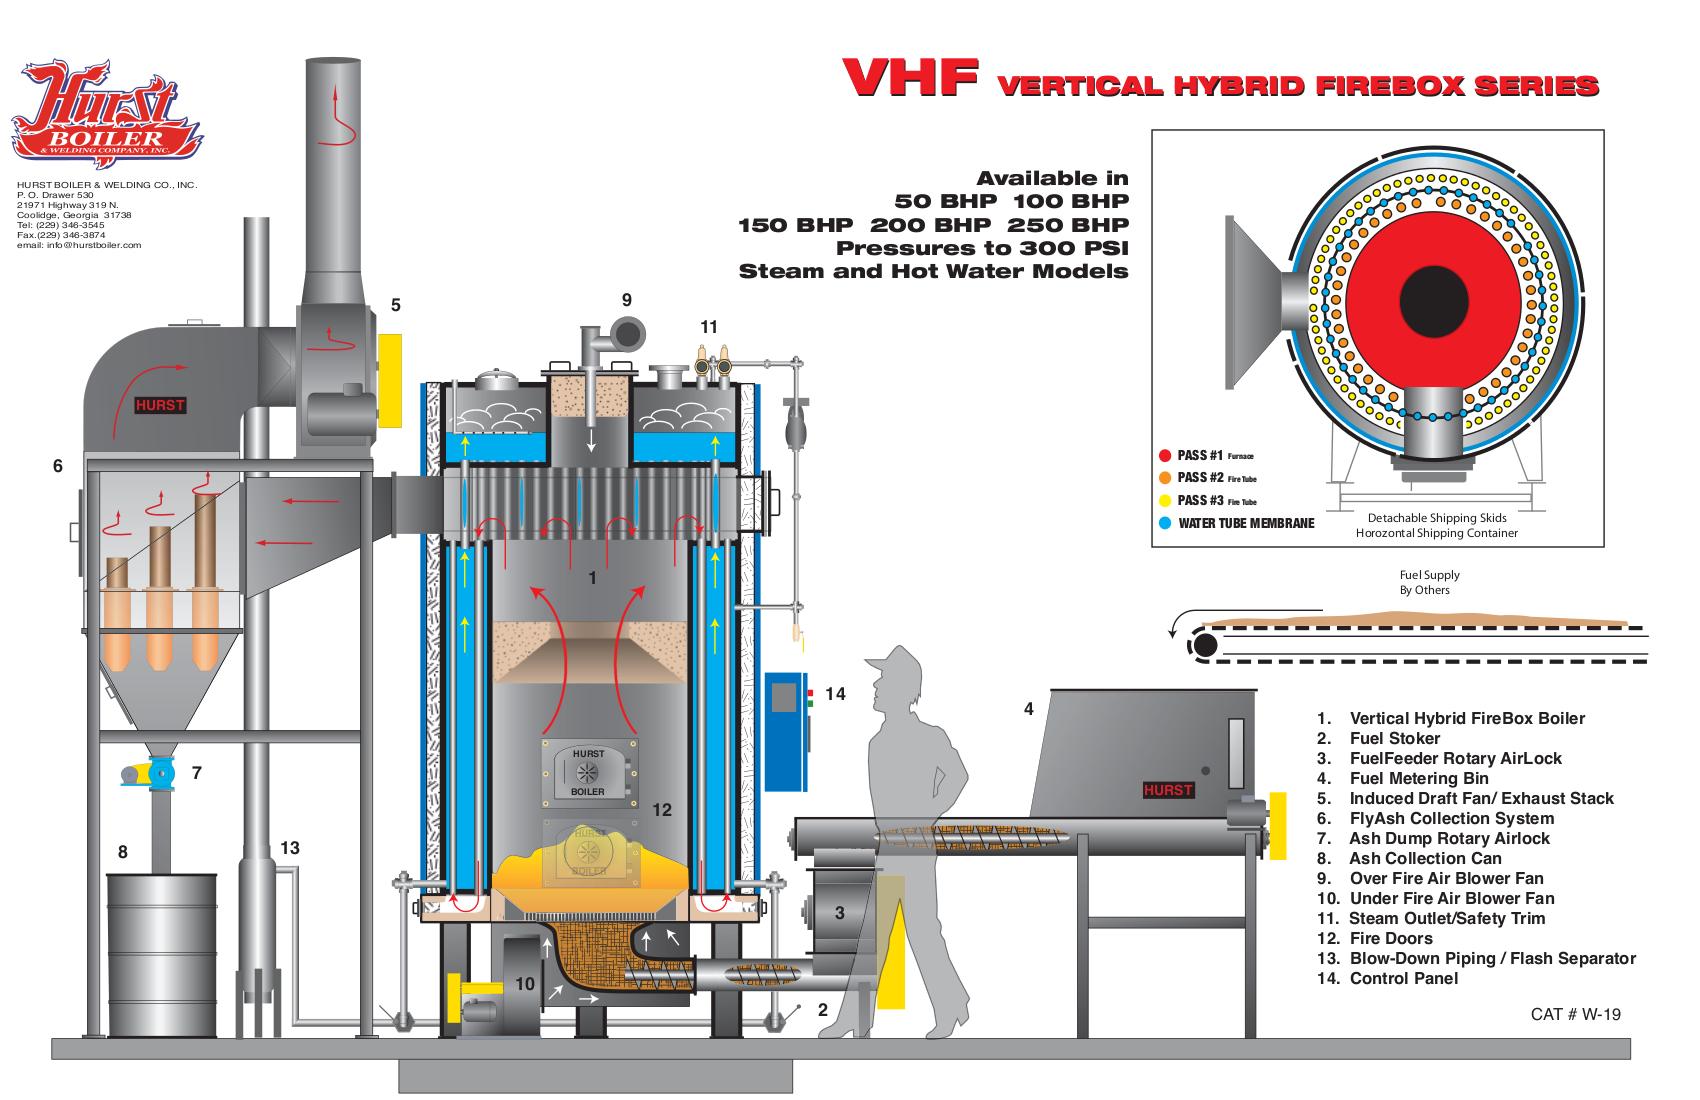 Hurst Boiler Wiring Diagram Best Secret Parts Circuit And Hub Control Gas